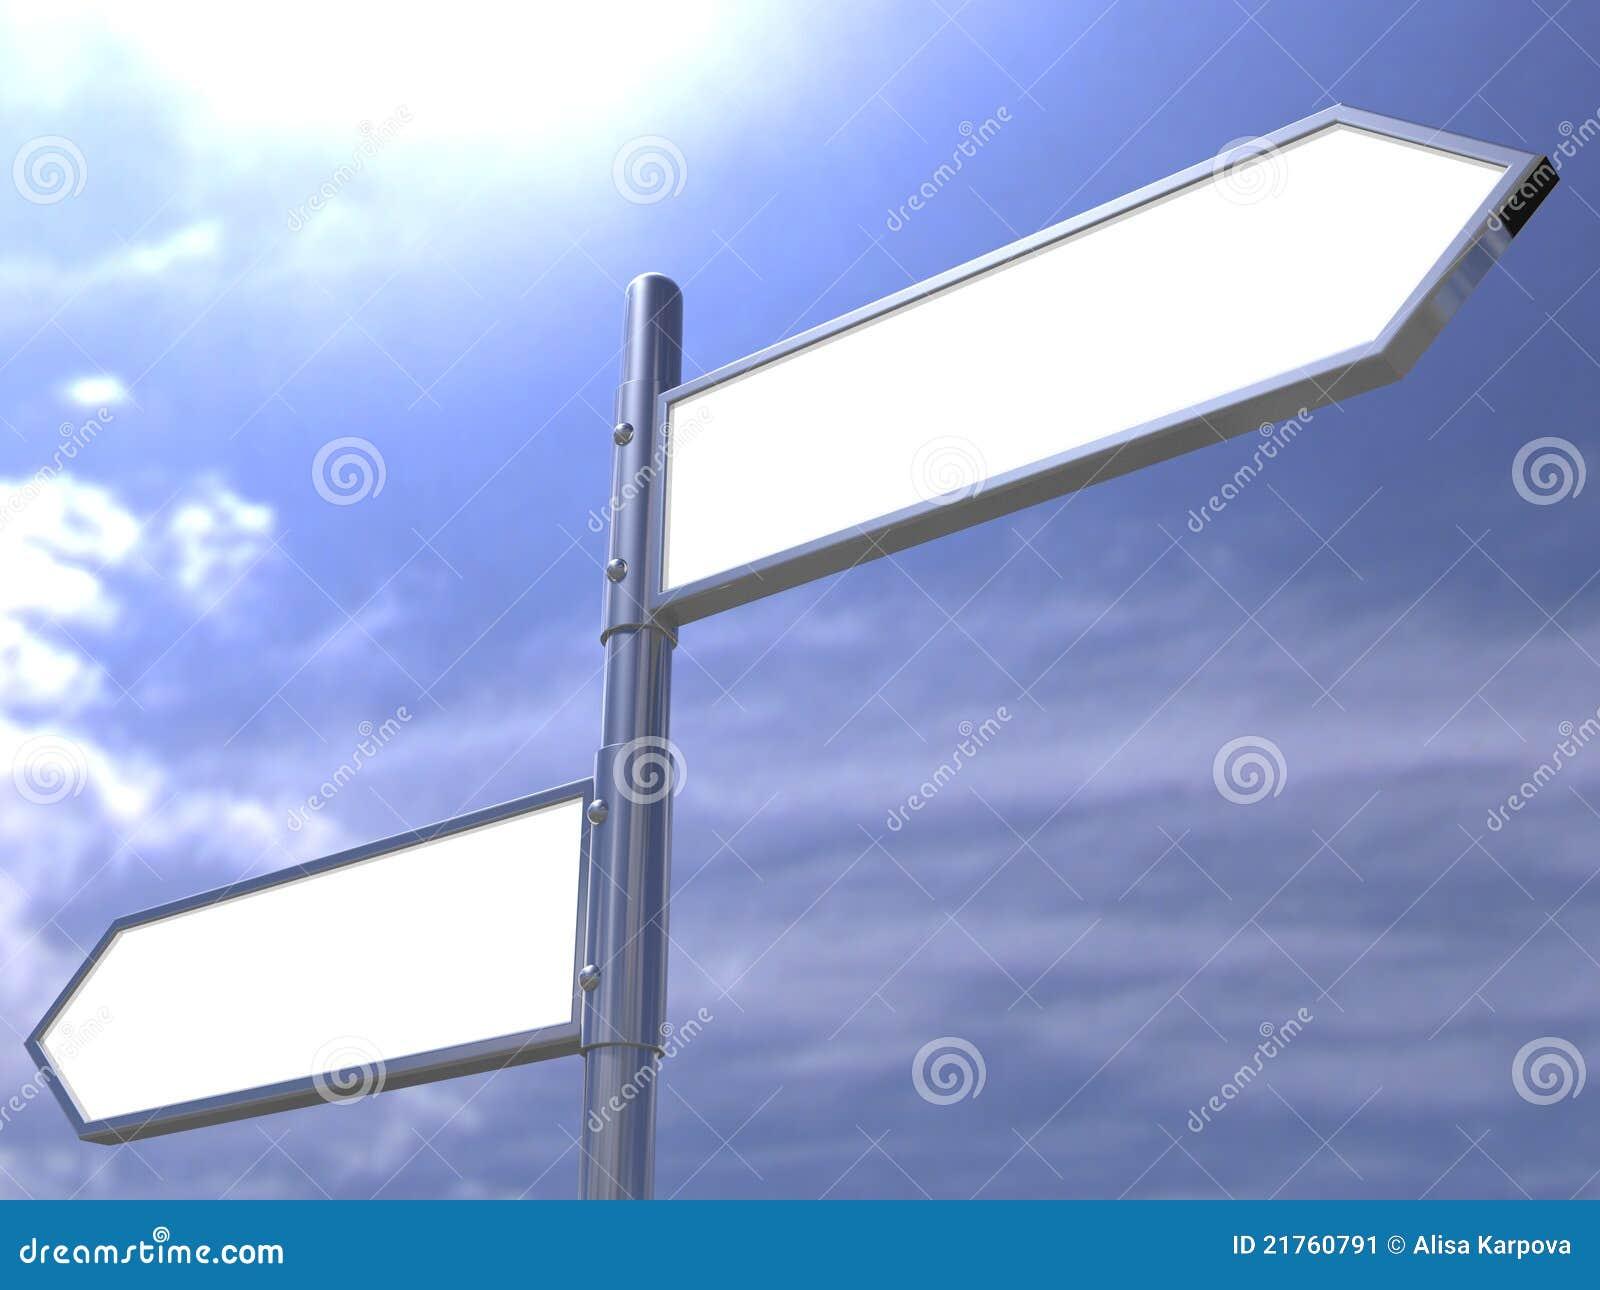 blank directional road sign post stock illustration illustration